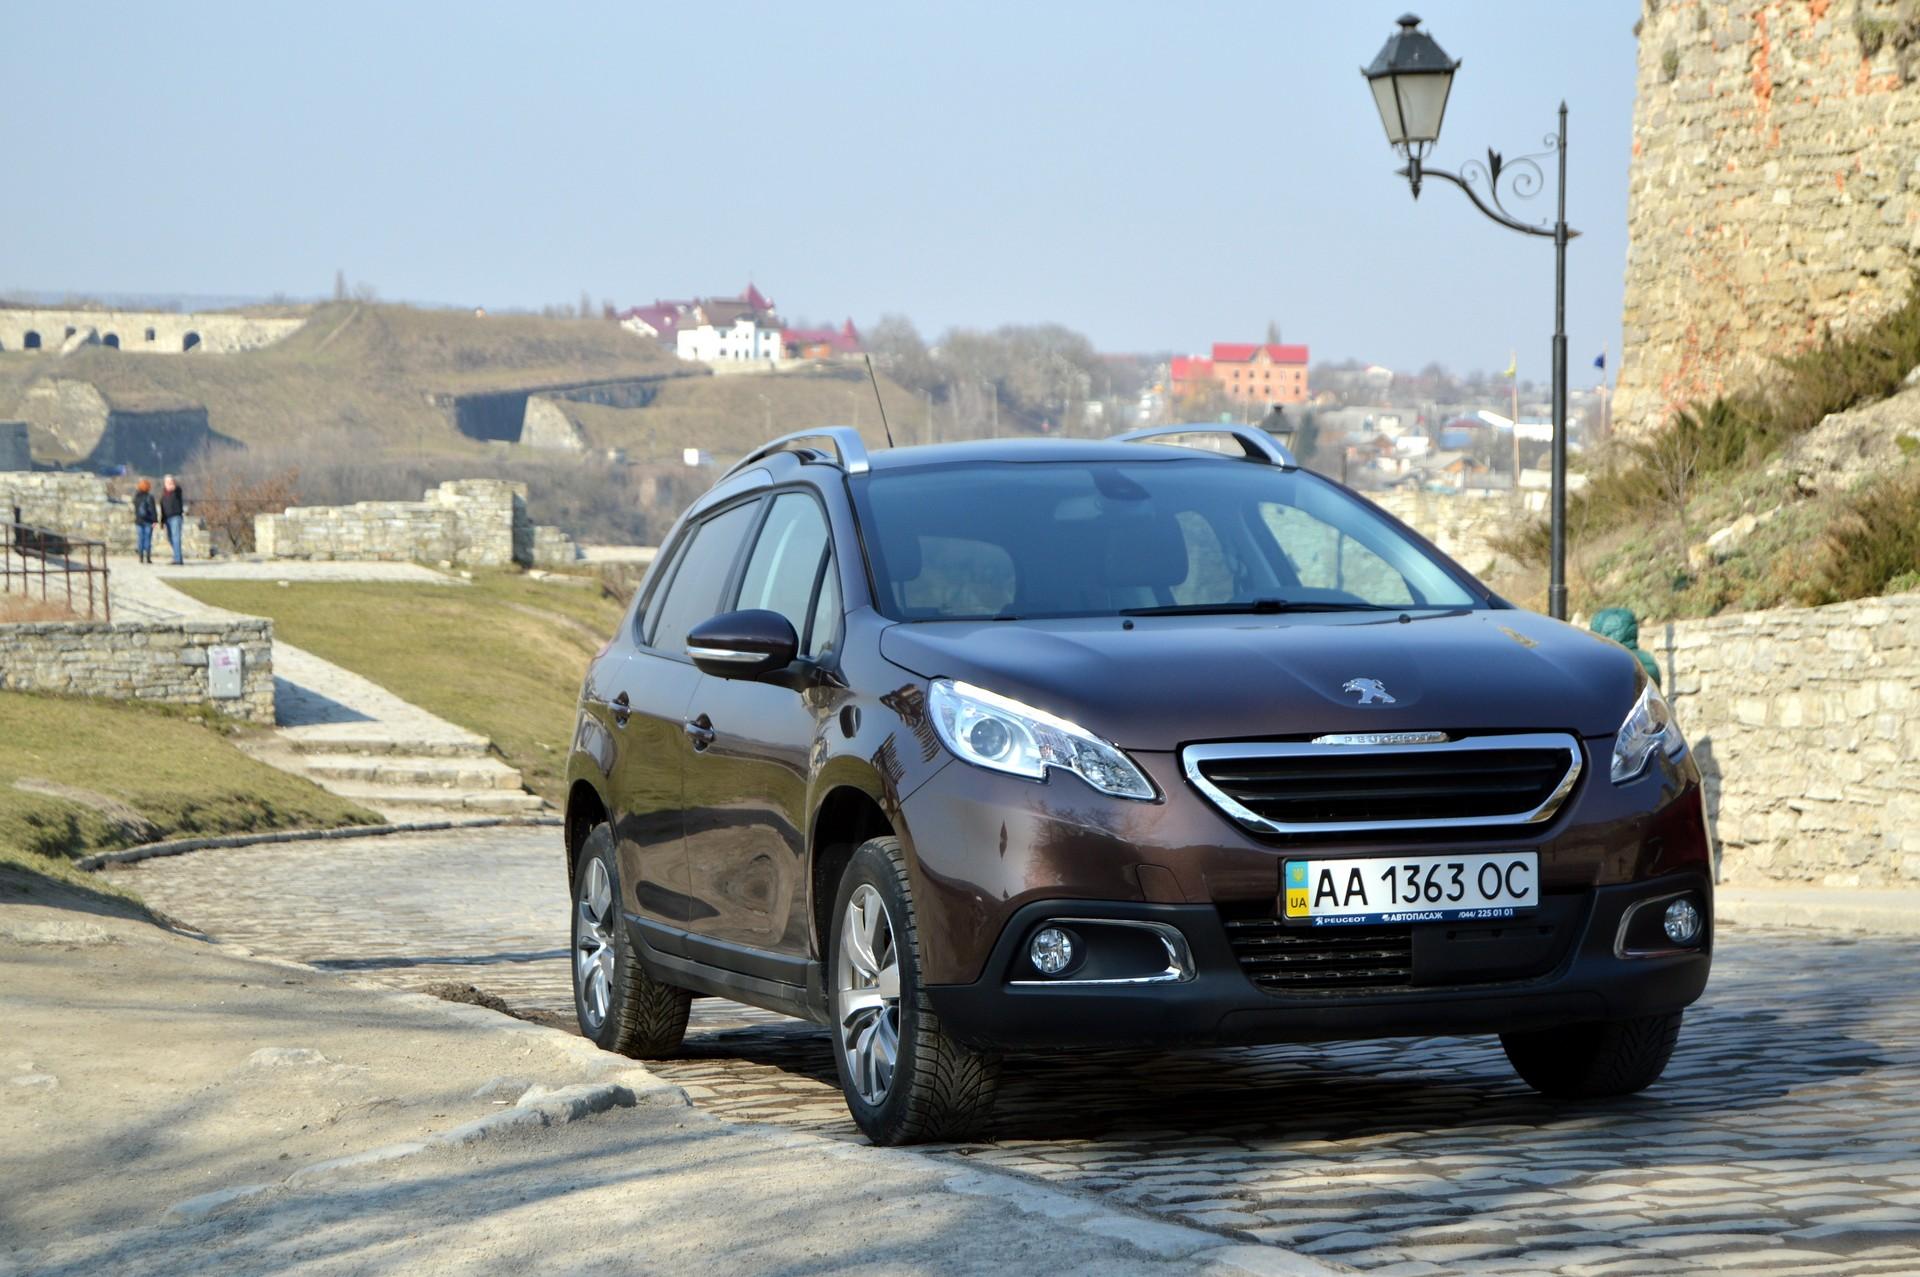 Тест-драйв Peugeot 2008 — смотрим на кроссовер по-новому